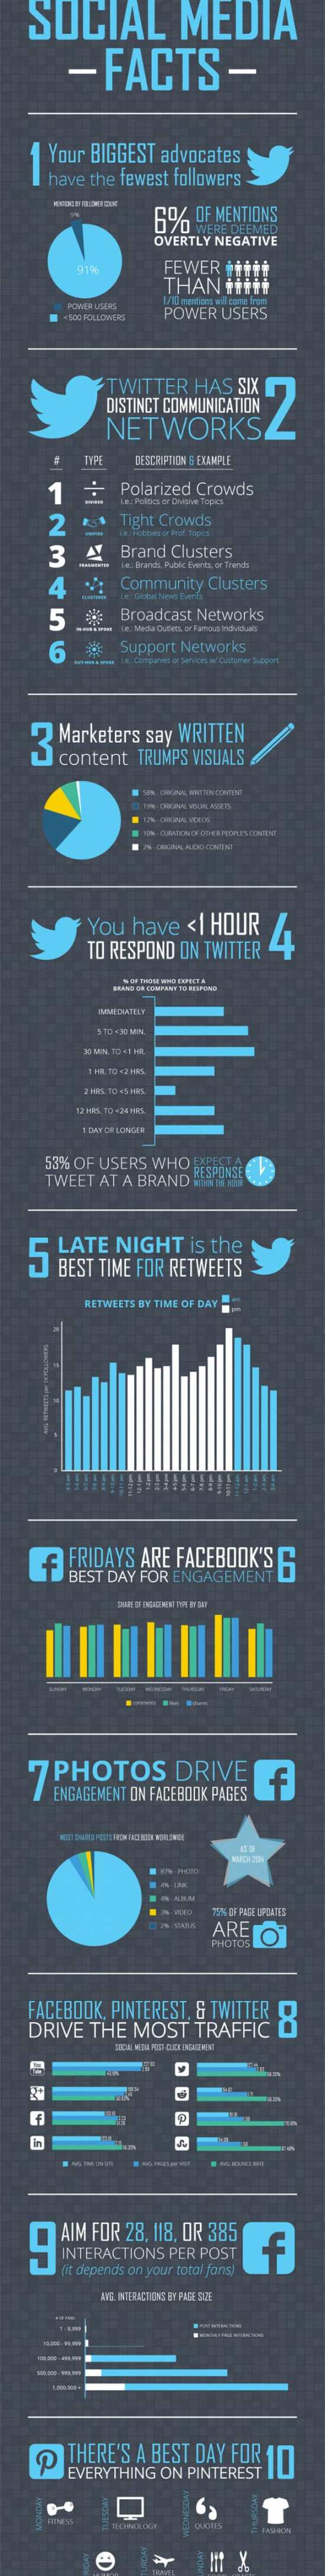 Social media facts you should know Seafoam Media